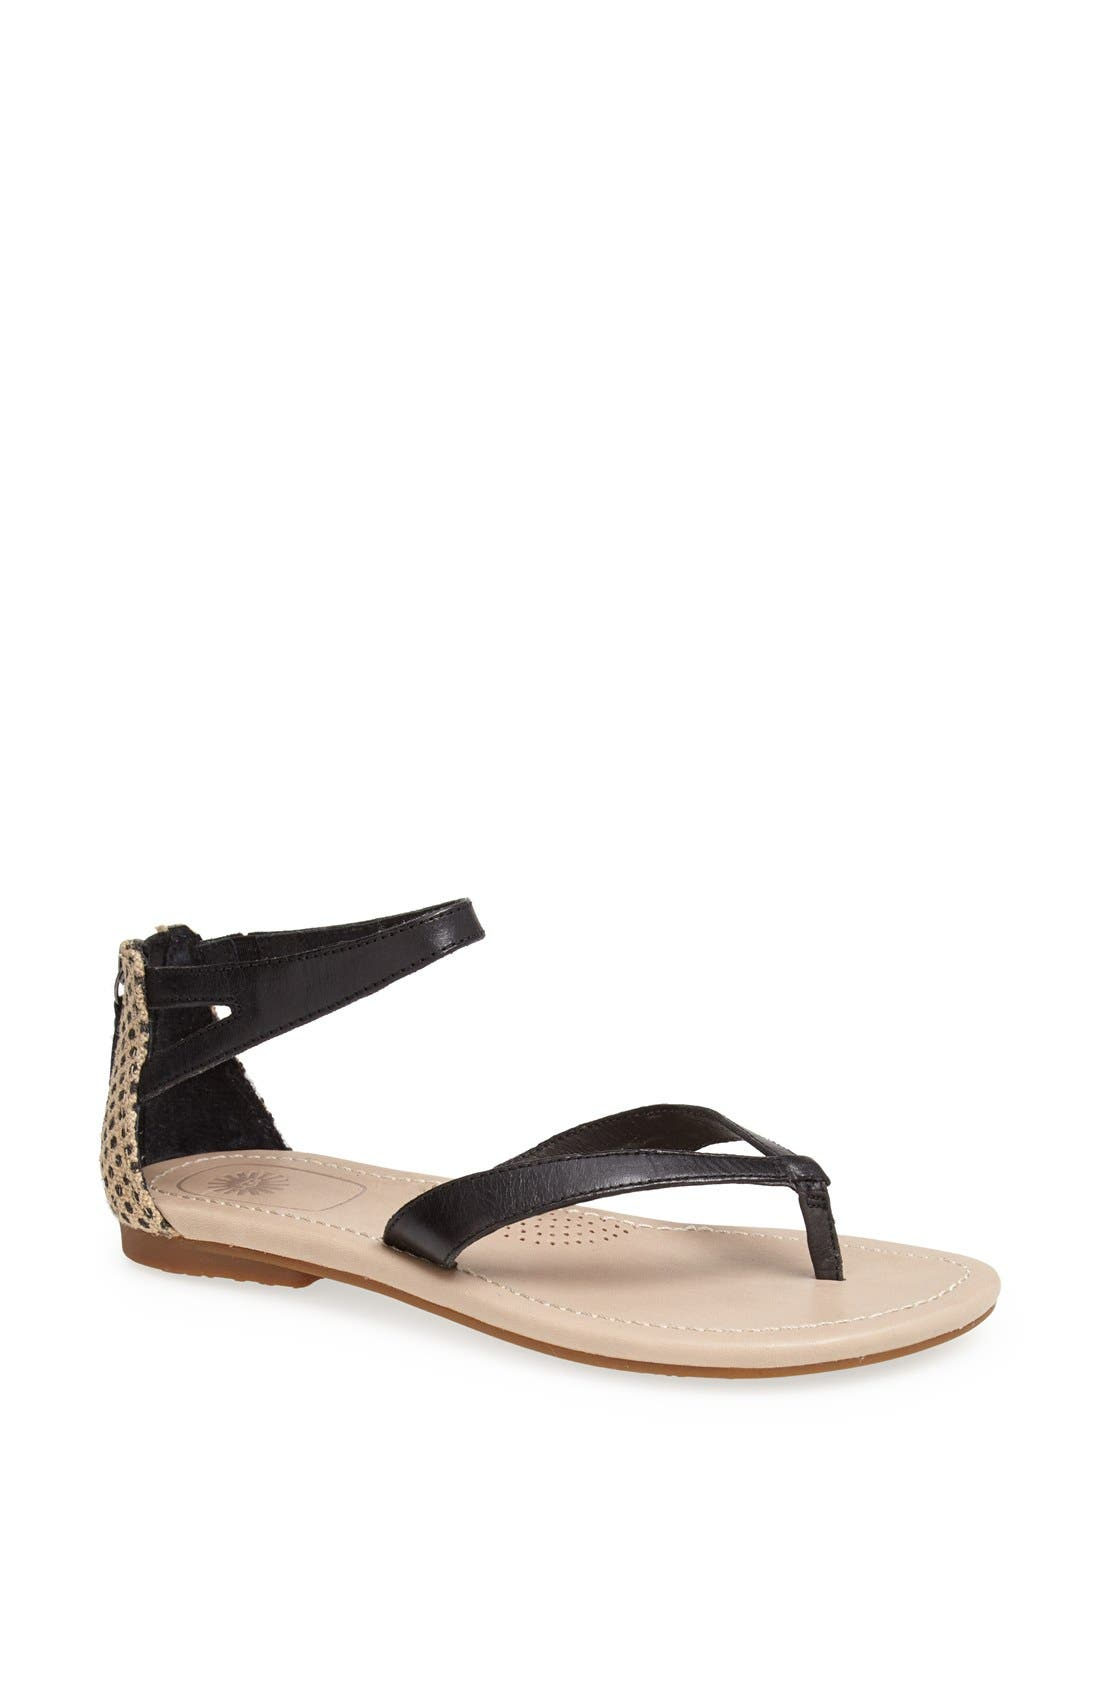 Main Image - UGG® Australia 'Tarra' Sandal